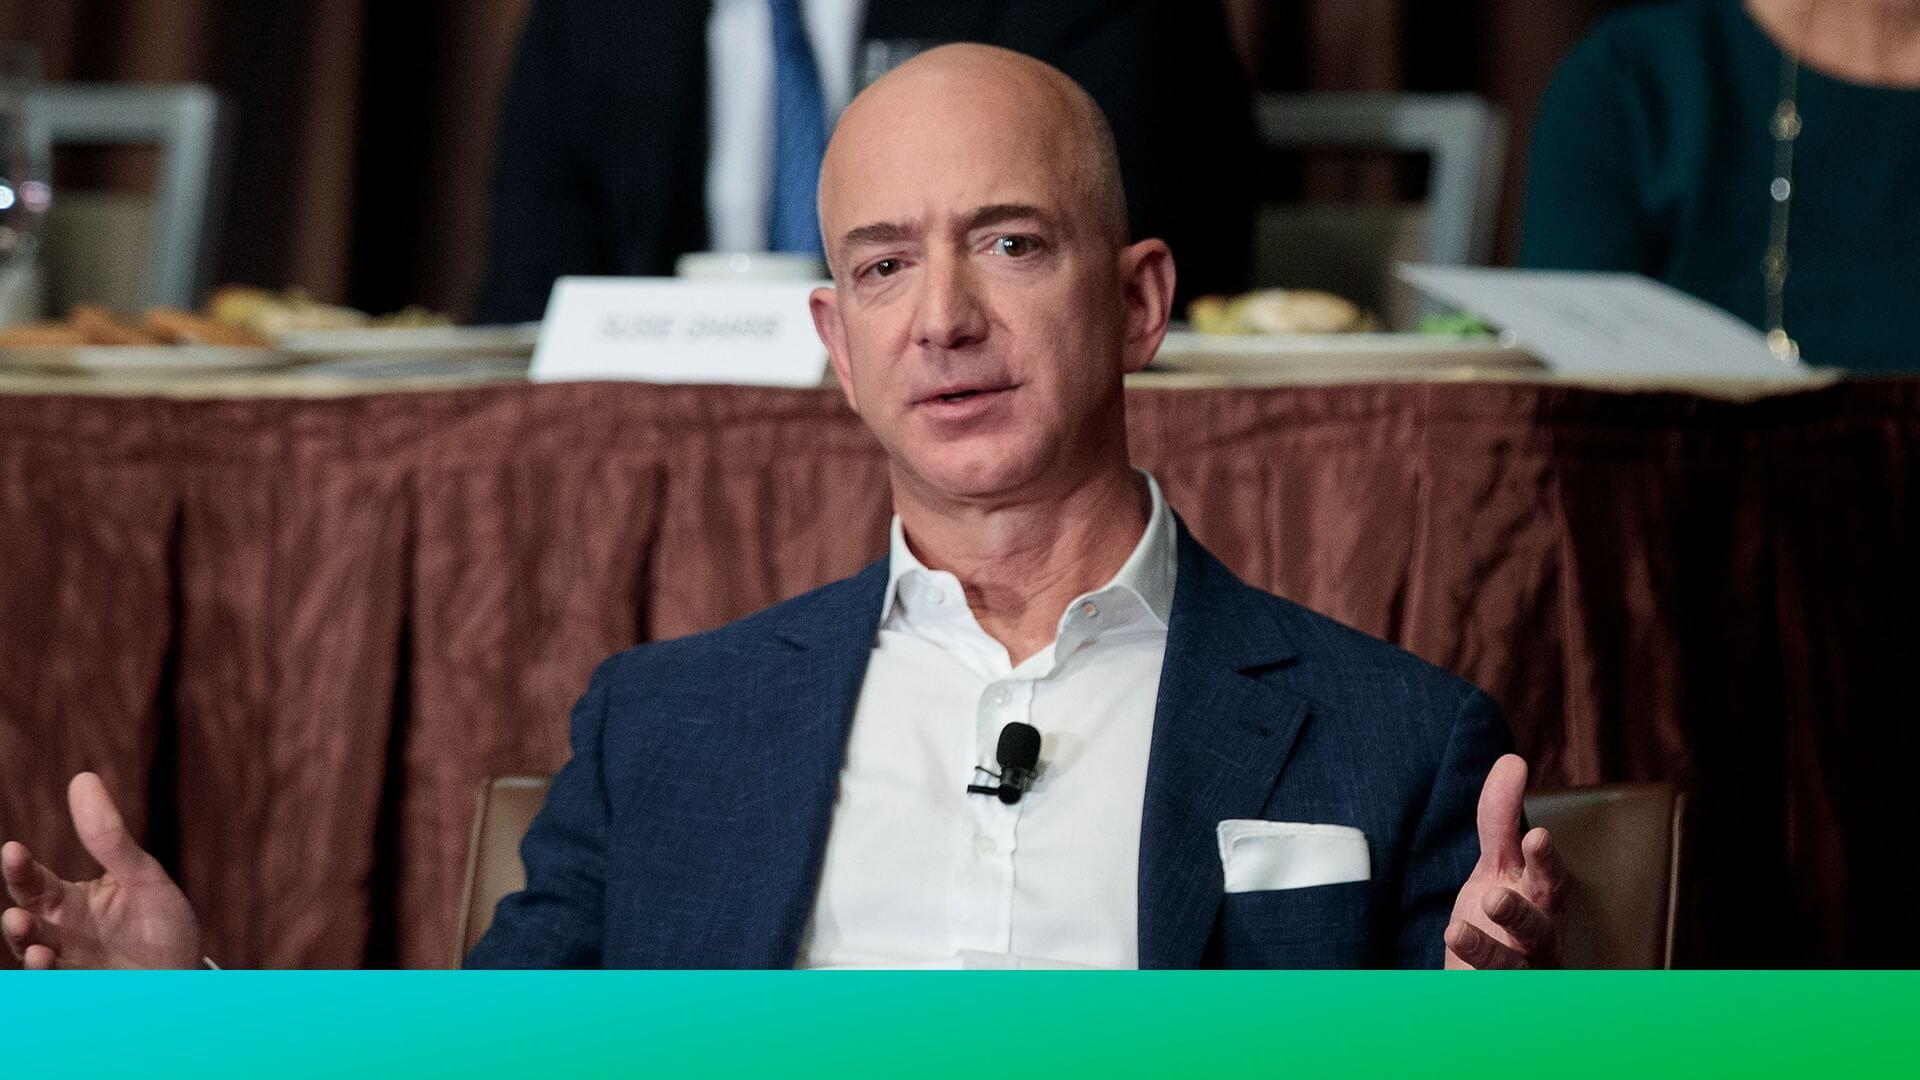 Amazon S Jeff Bezos Surges Past Bill Gates As World S Richest Person